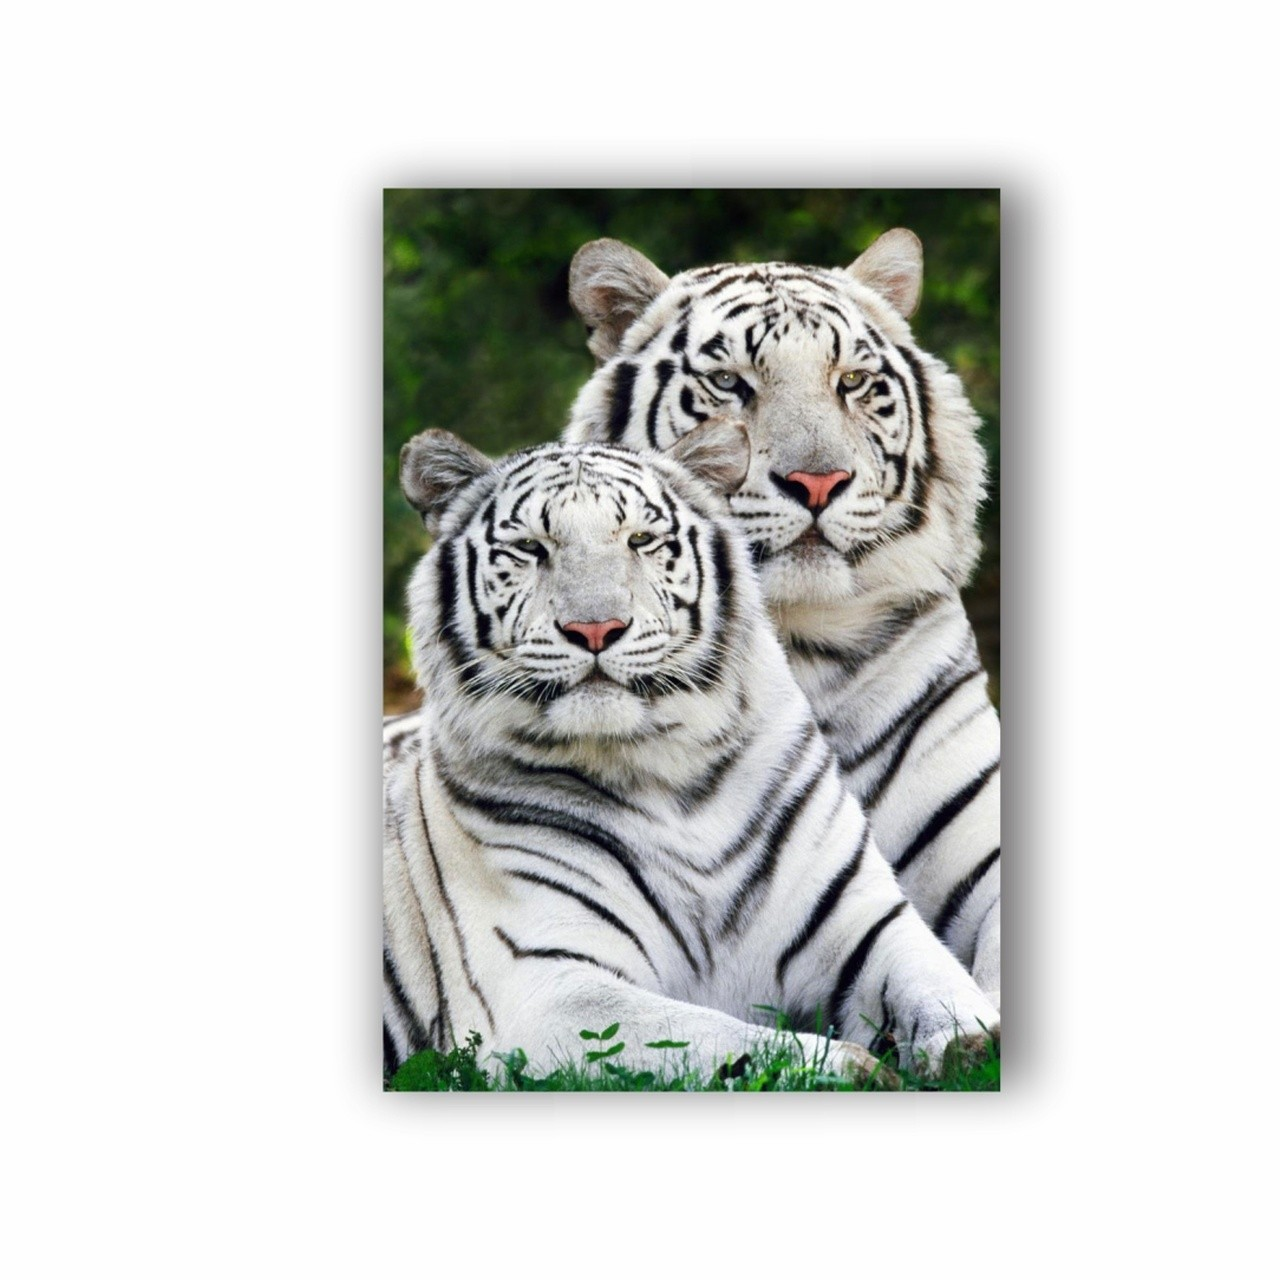 Quadro Casal Tigre Vertical - Tela Única